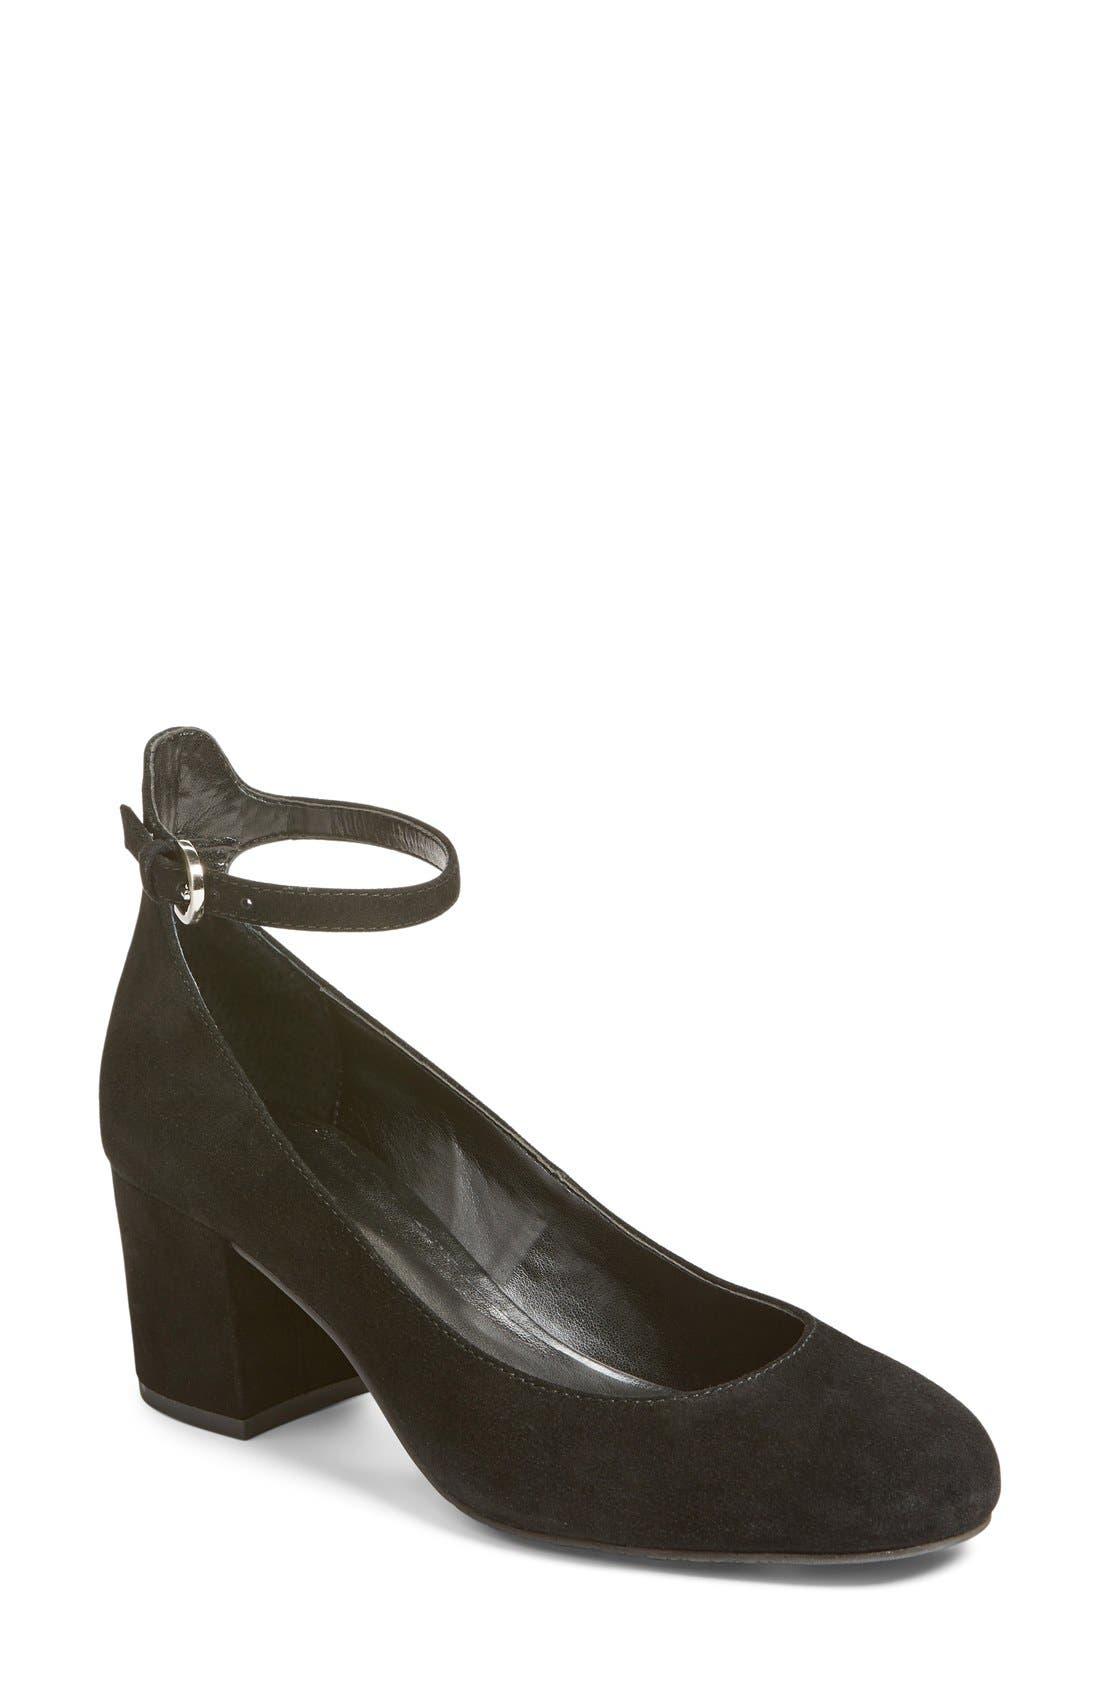 Alternate Image 1 Selected - BP. Ankle Strap Block Heel Pump (Women)